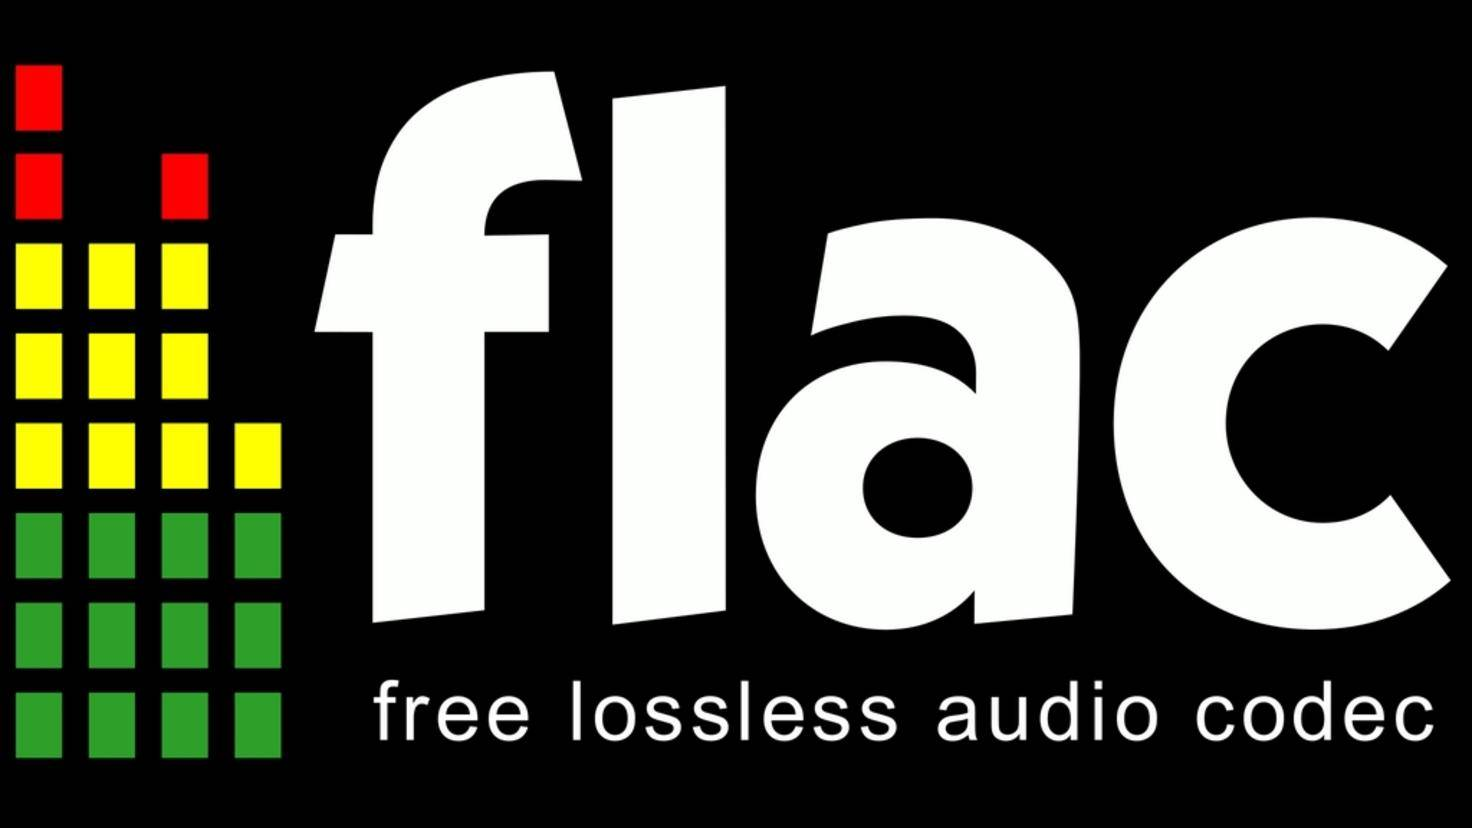 FLAC-Logo